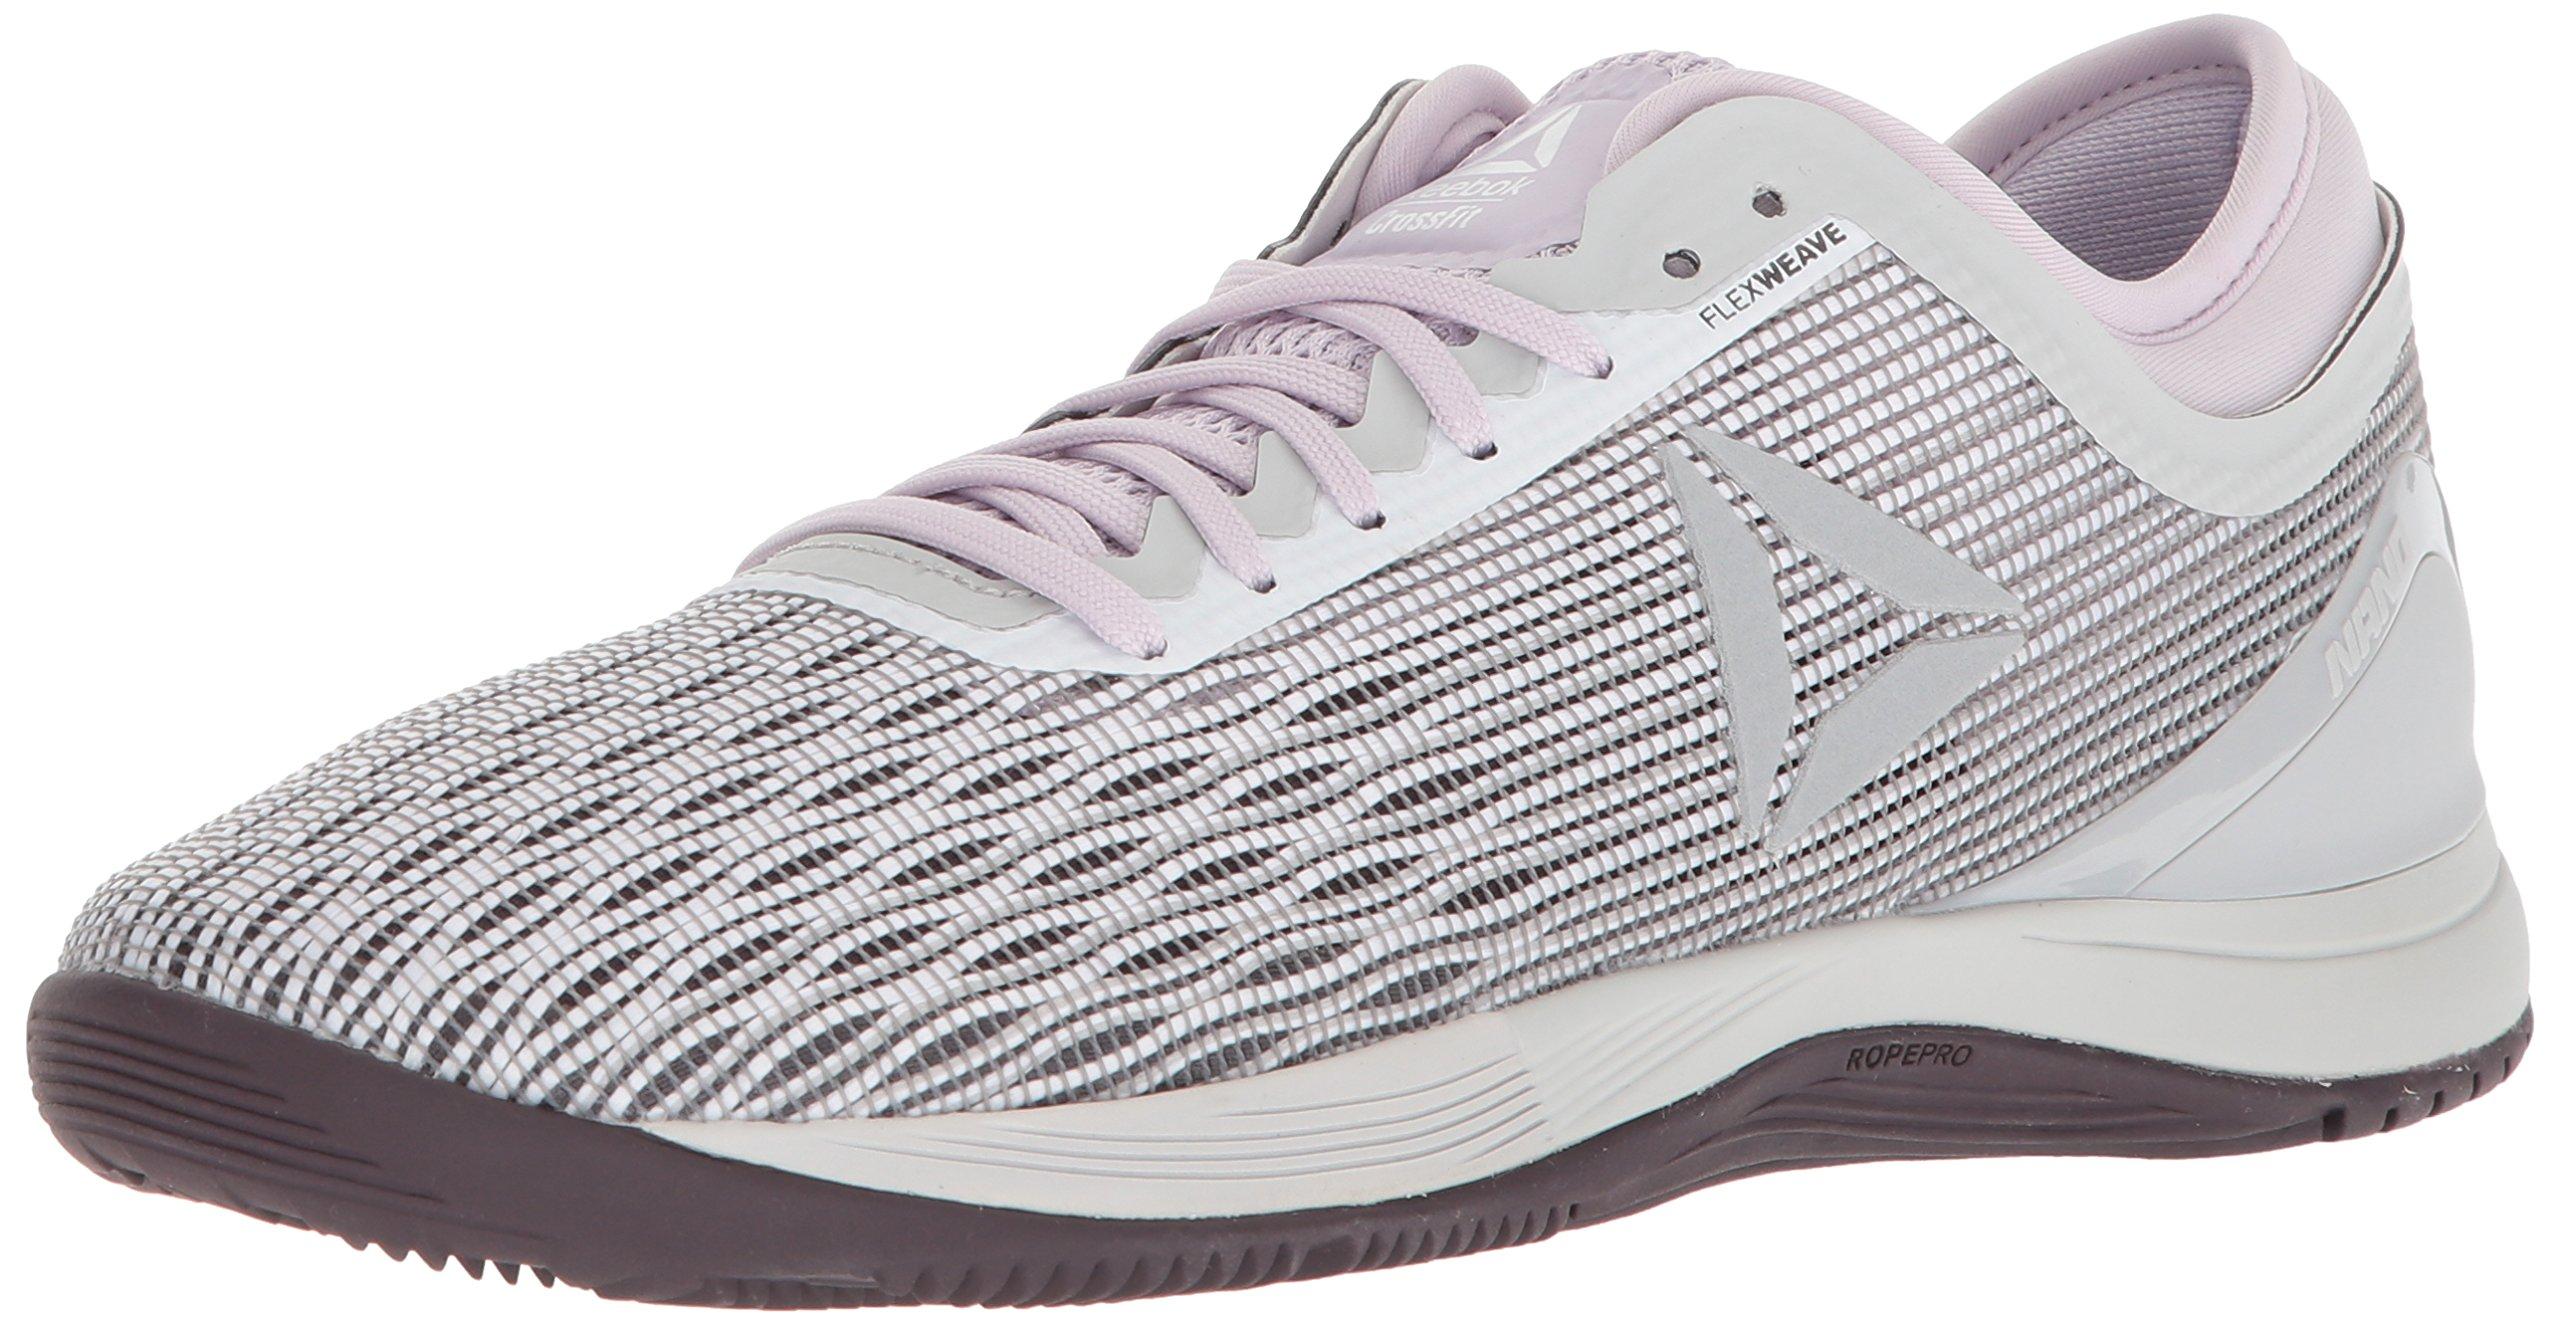 Reebok Women's Crossfit Nano 8.0 Sneaker, White/Stark Grey/Quartz/s, 9.5 M US